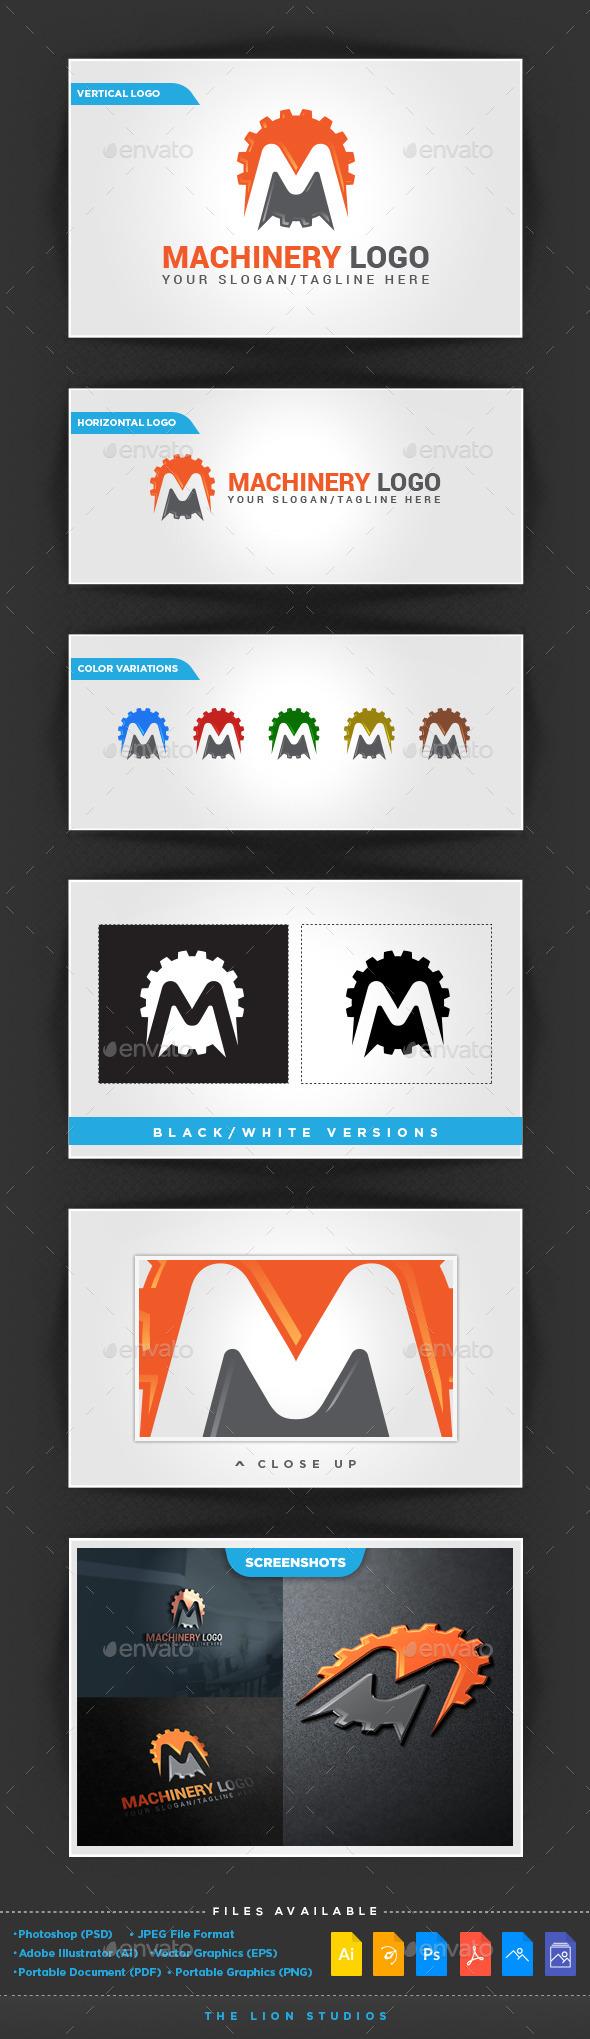 GraphicRiver Machinery Logo Template 10106667